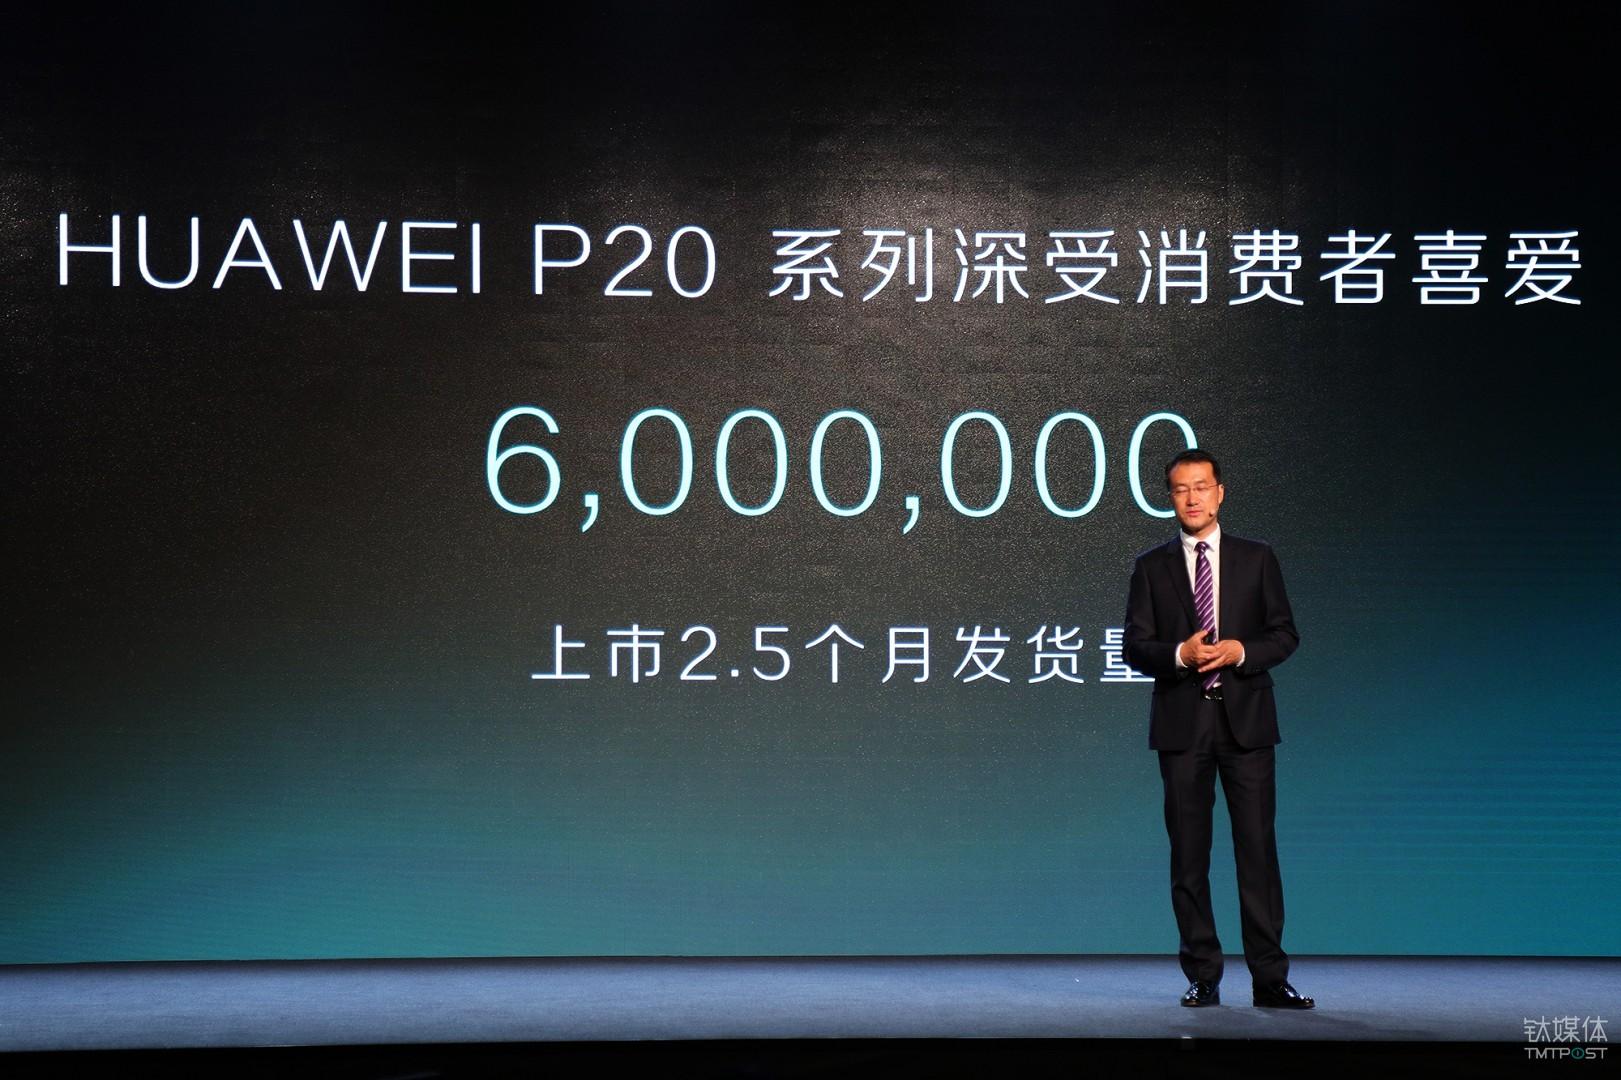 P20系列产品上市2.5个月突破6百万台